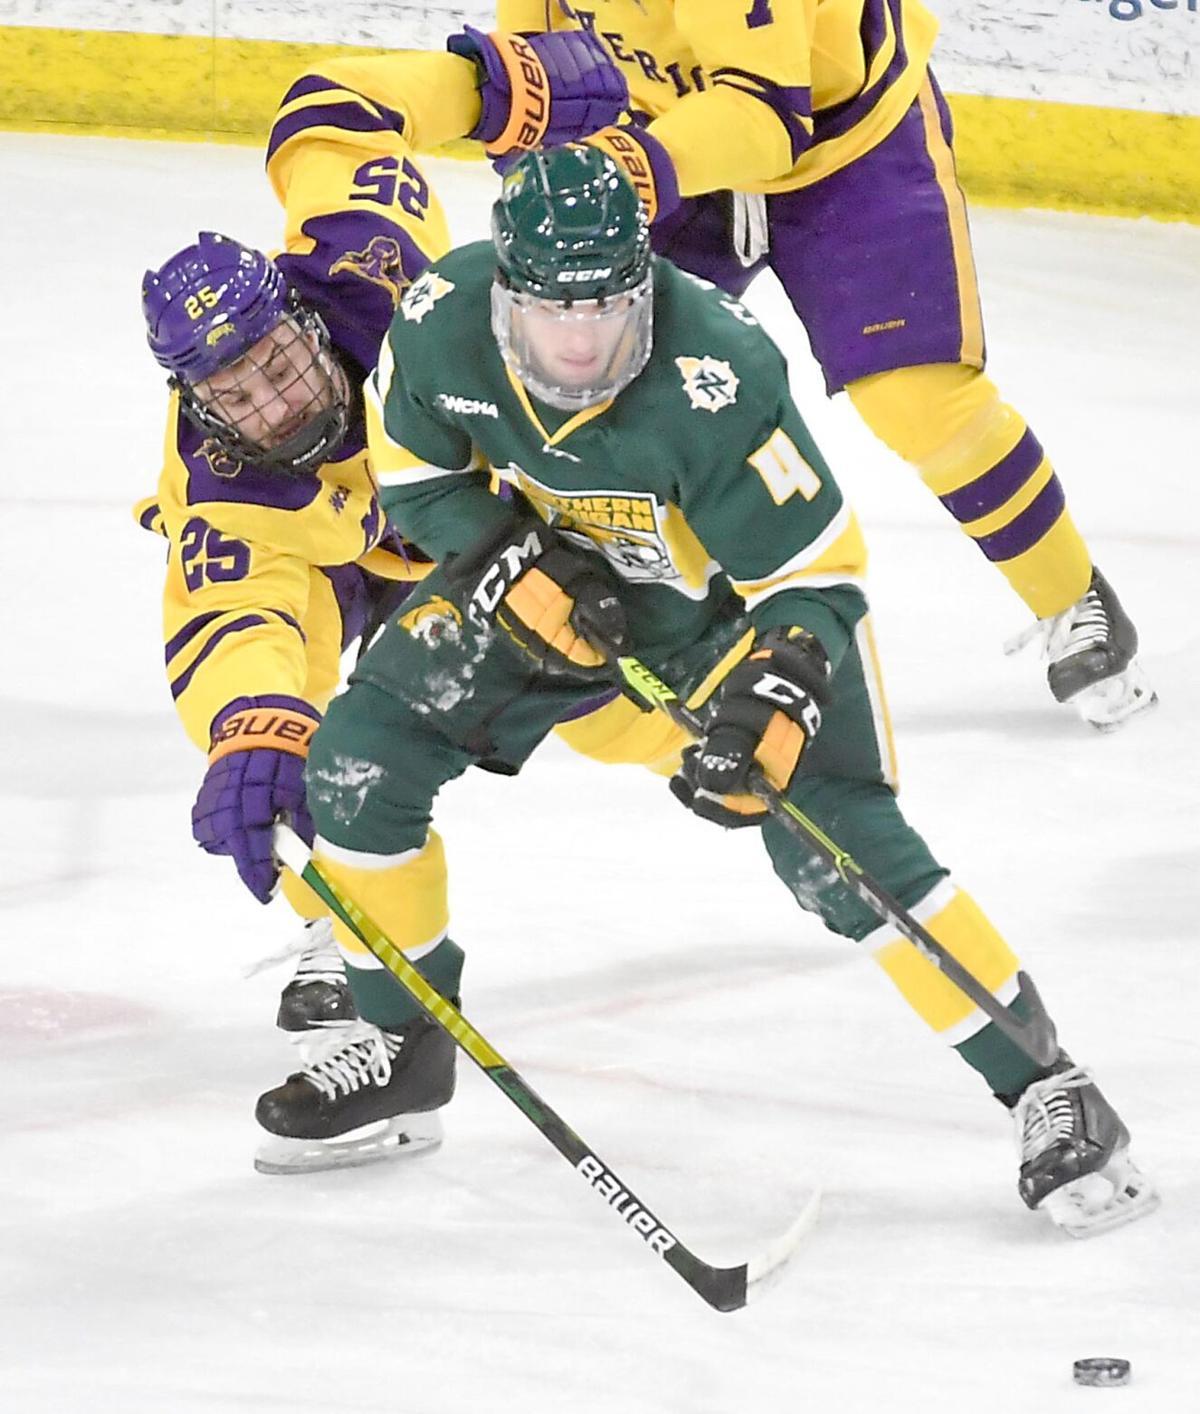 MSU men's hockey v. Northern Michigan 2